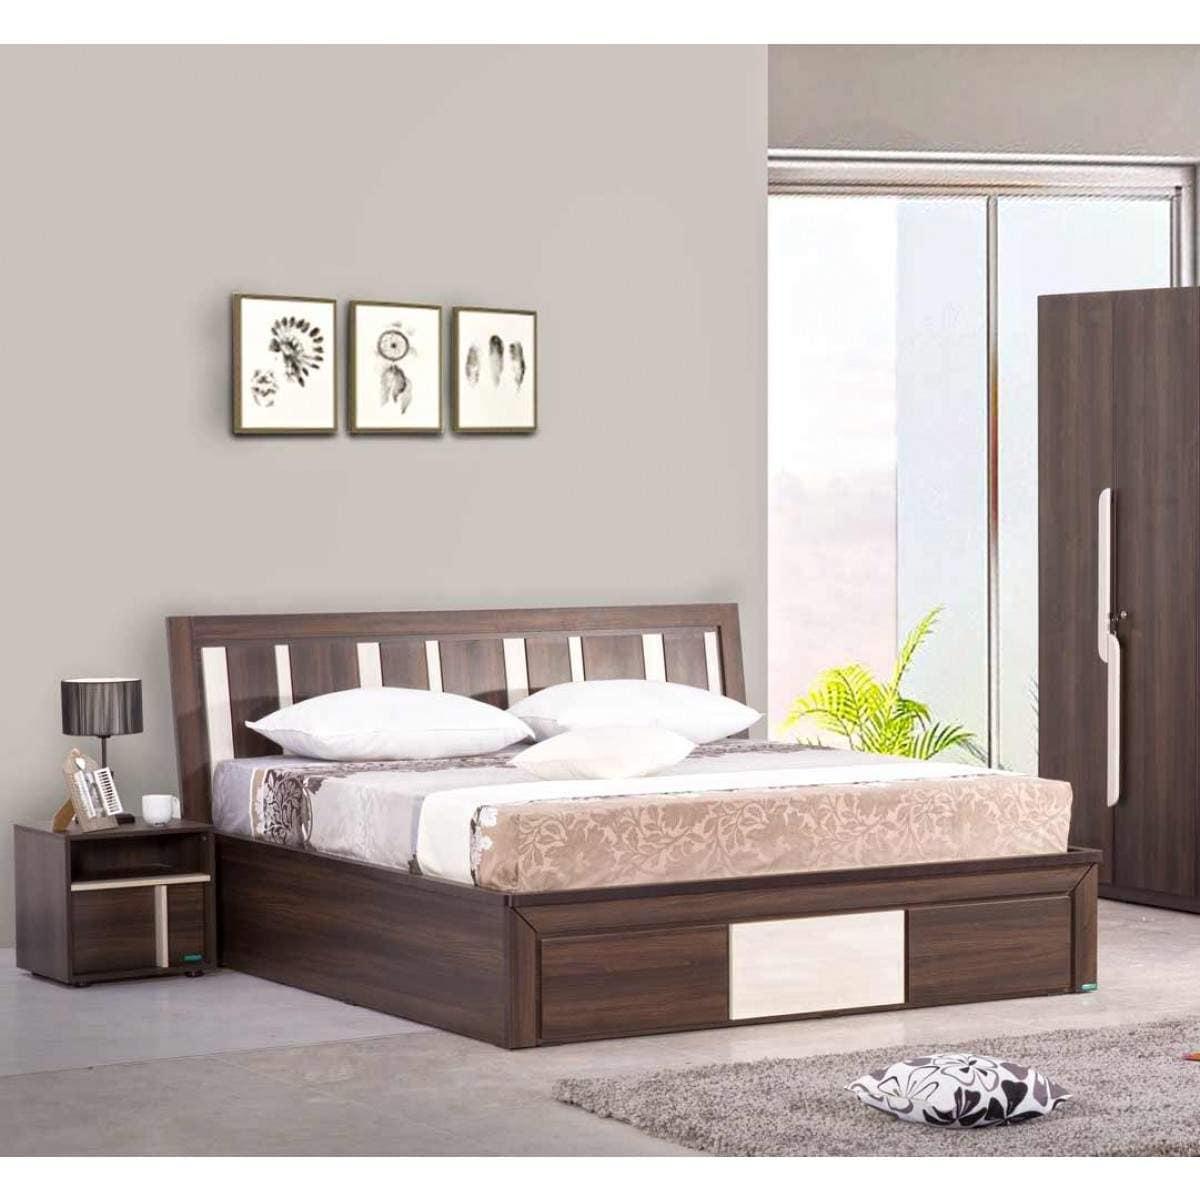 Buy Damro Felicia 4 Piece Bedroom Set Features Price Reviews Online In India Justdial